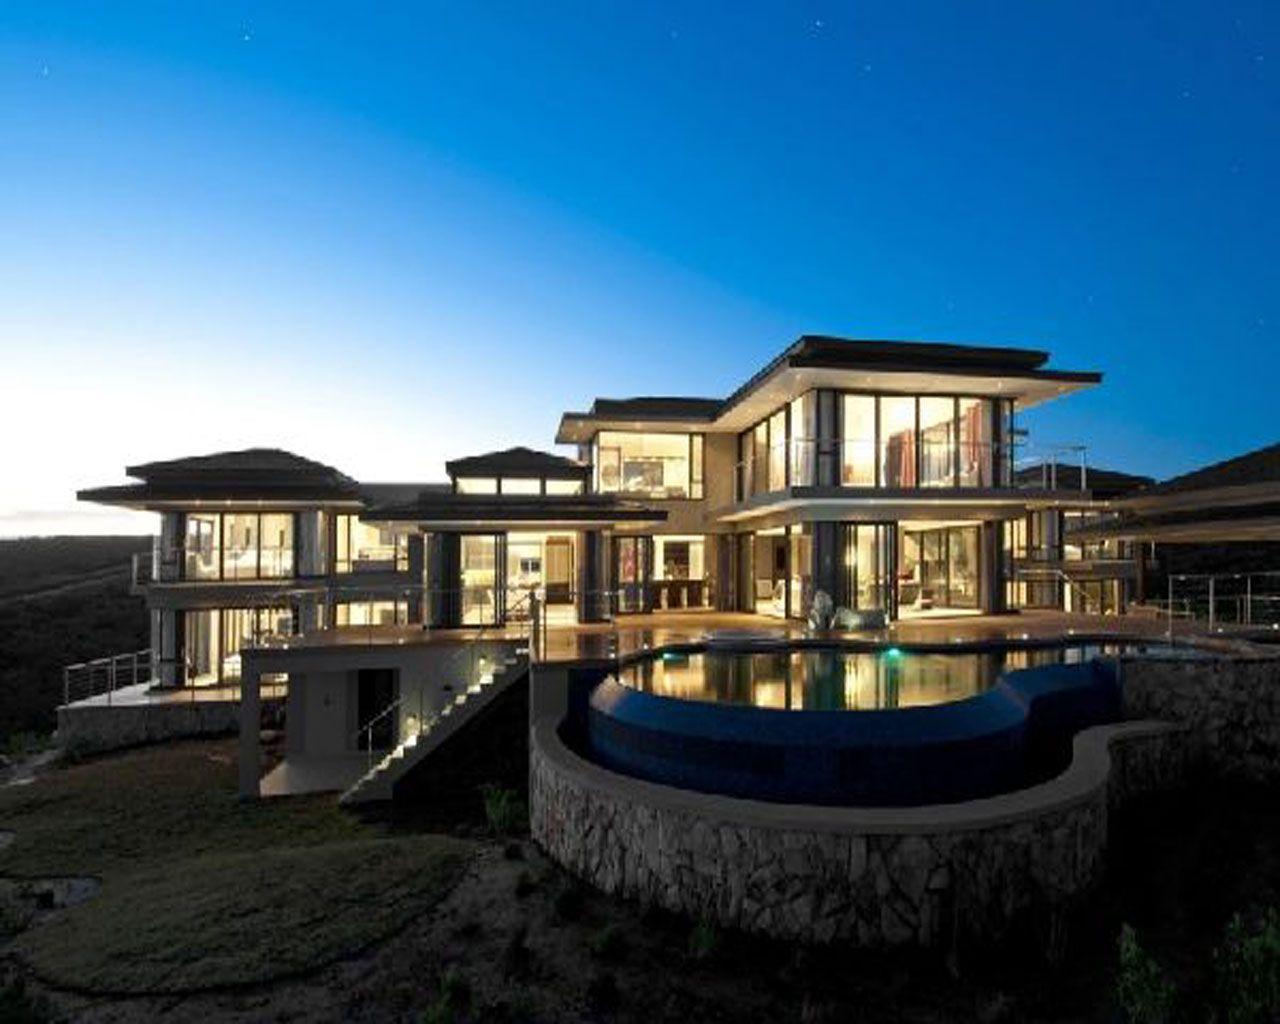 House ideas design beautiful interior and exterior also rh pinterest